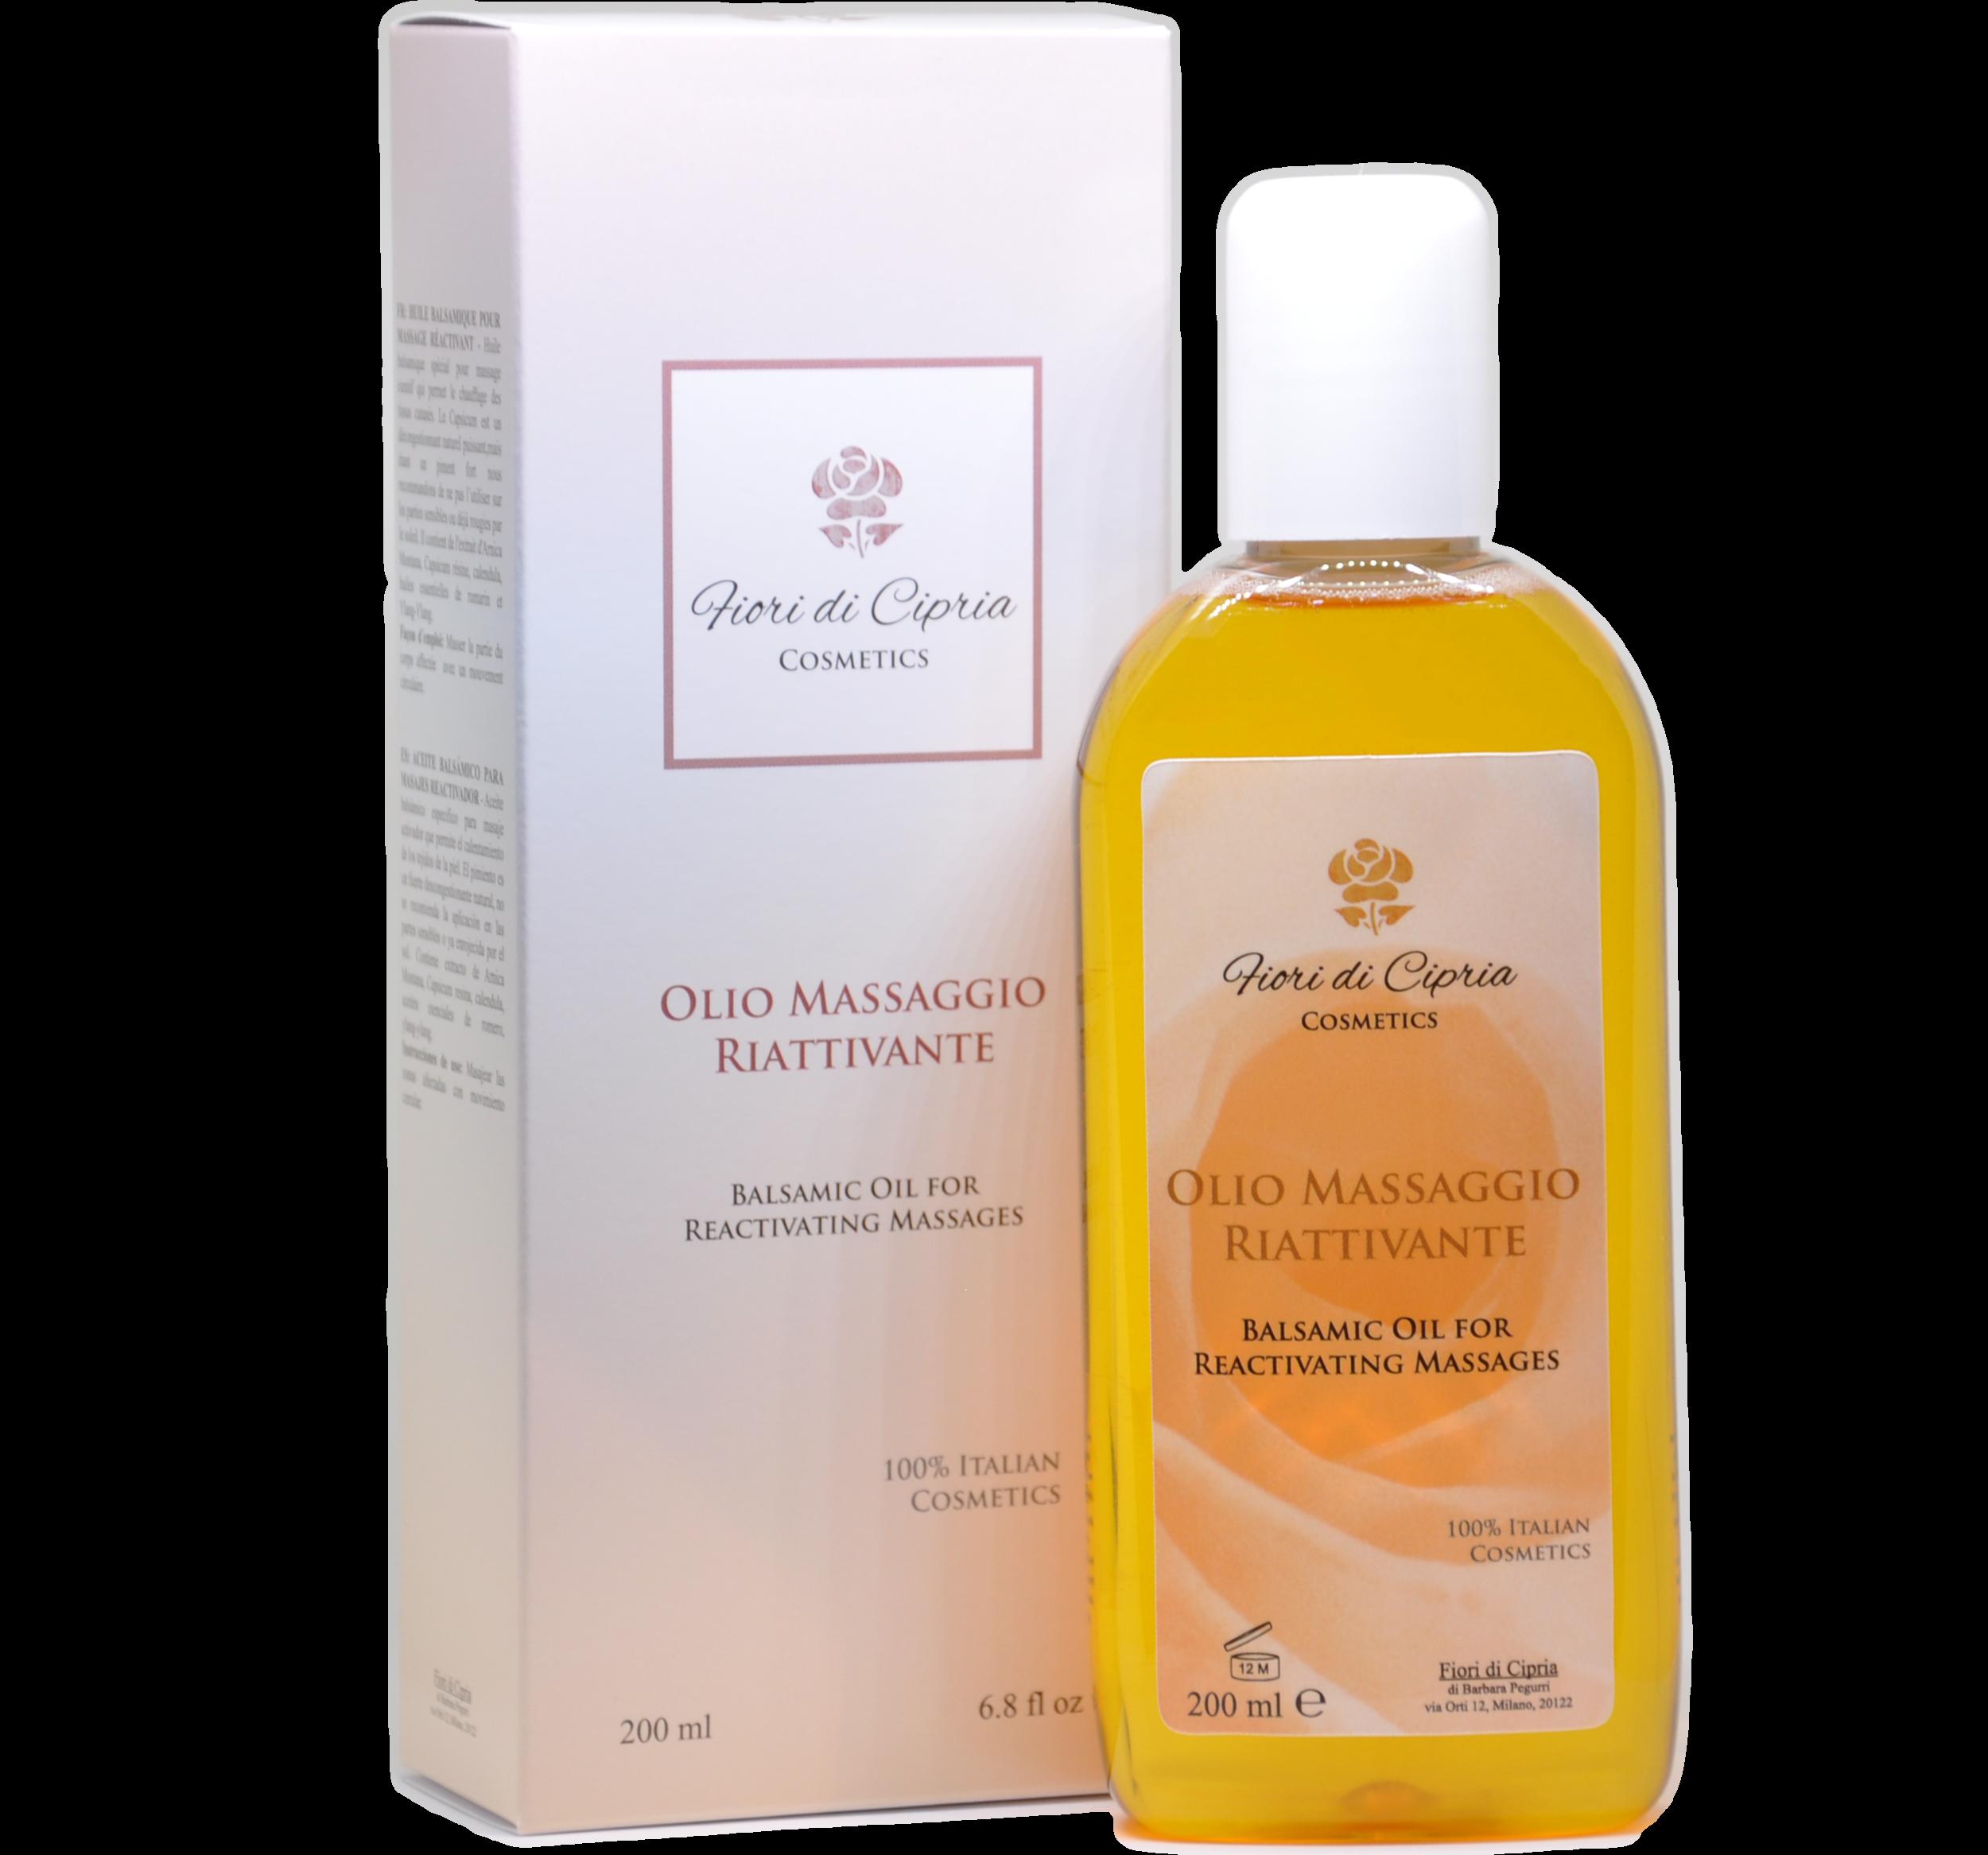 Balsamic Oil For Reactivating Massages